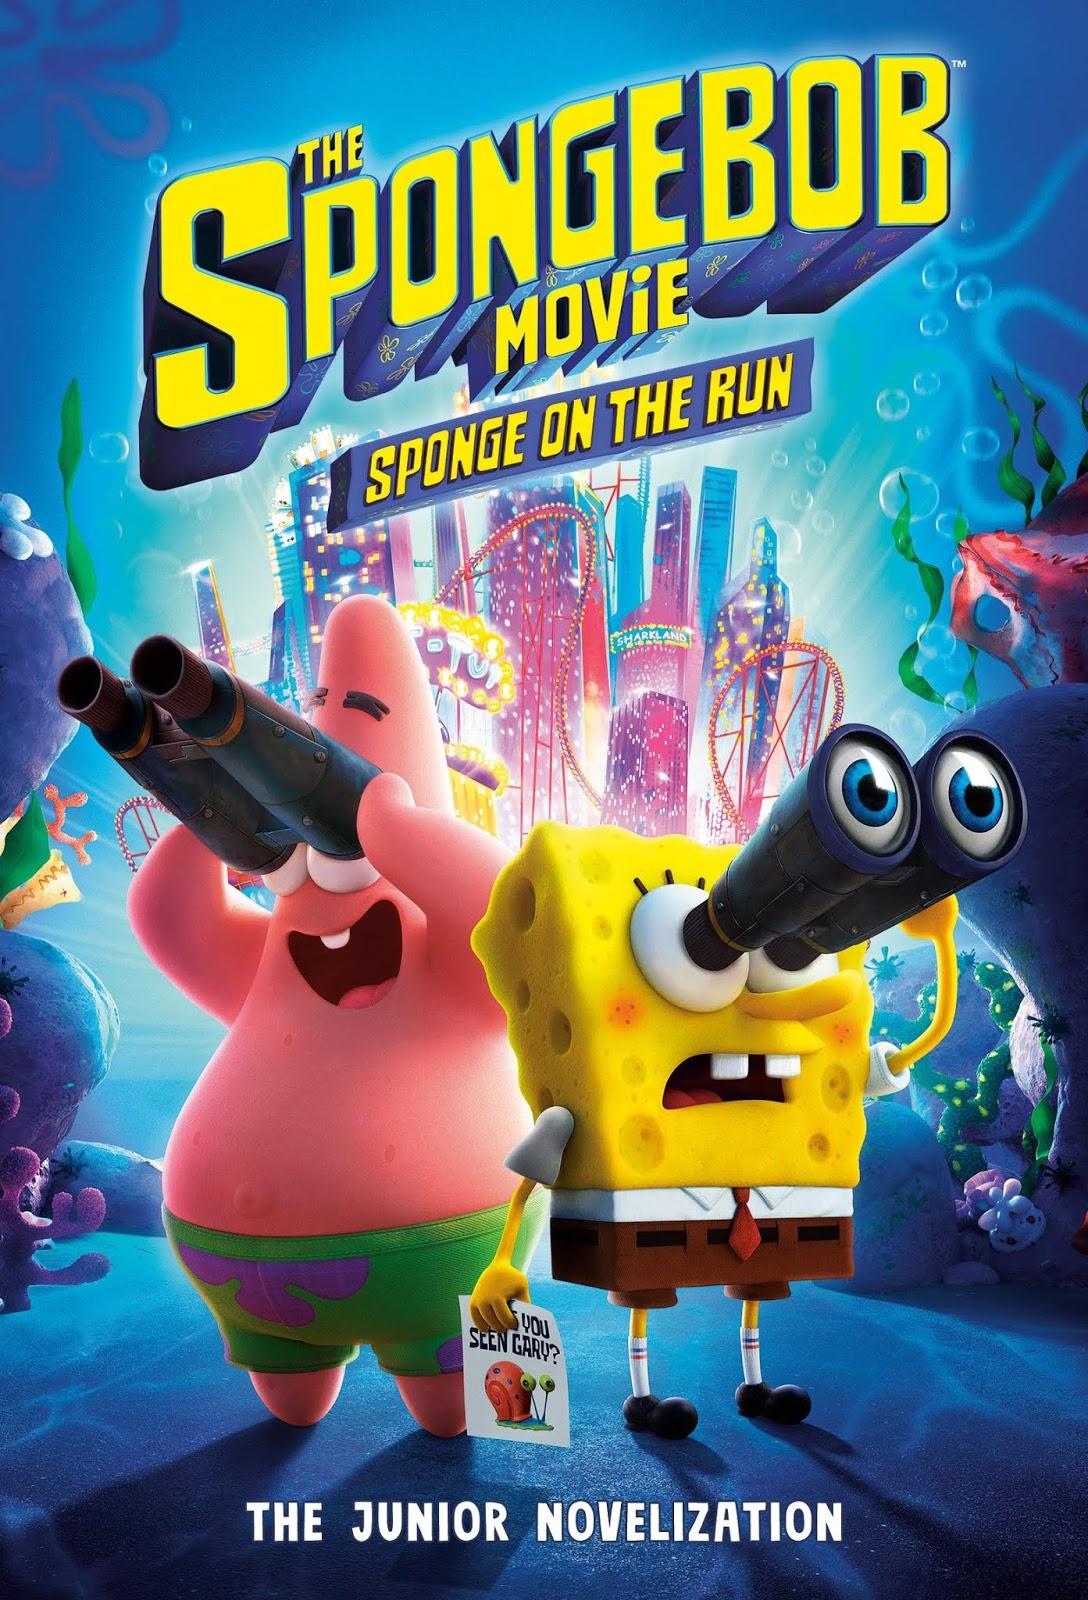 Xem Phim SpongeBob: Bọt Biển Đào Tẩu - The SpongeBob Movie: Sponge on the Run Full Vietsub | Thuyết Minh HD Online